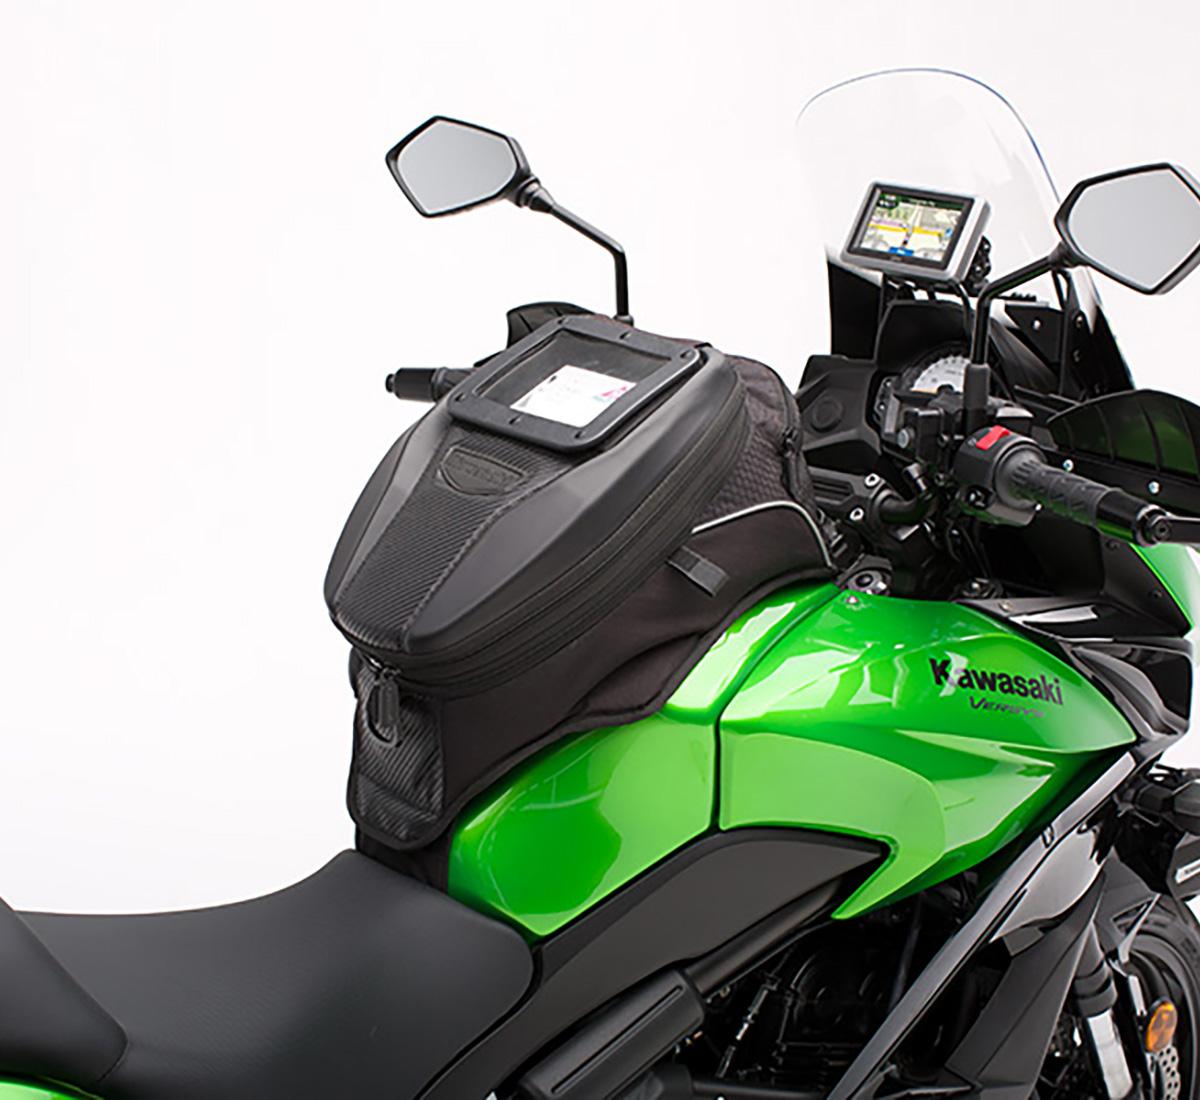 2018 versys 650 lt versys motorcycle by kawasaki rh kawasaki com 2018 kawasaki versys 650 2015 [ 1200 x 1100 Pixel ]